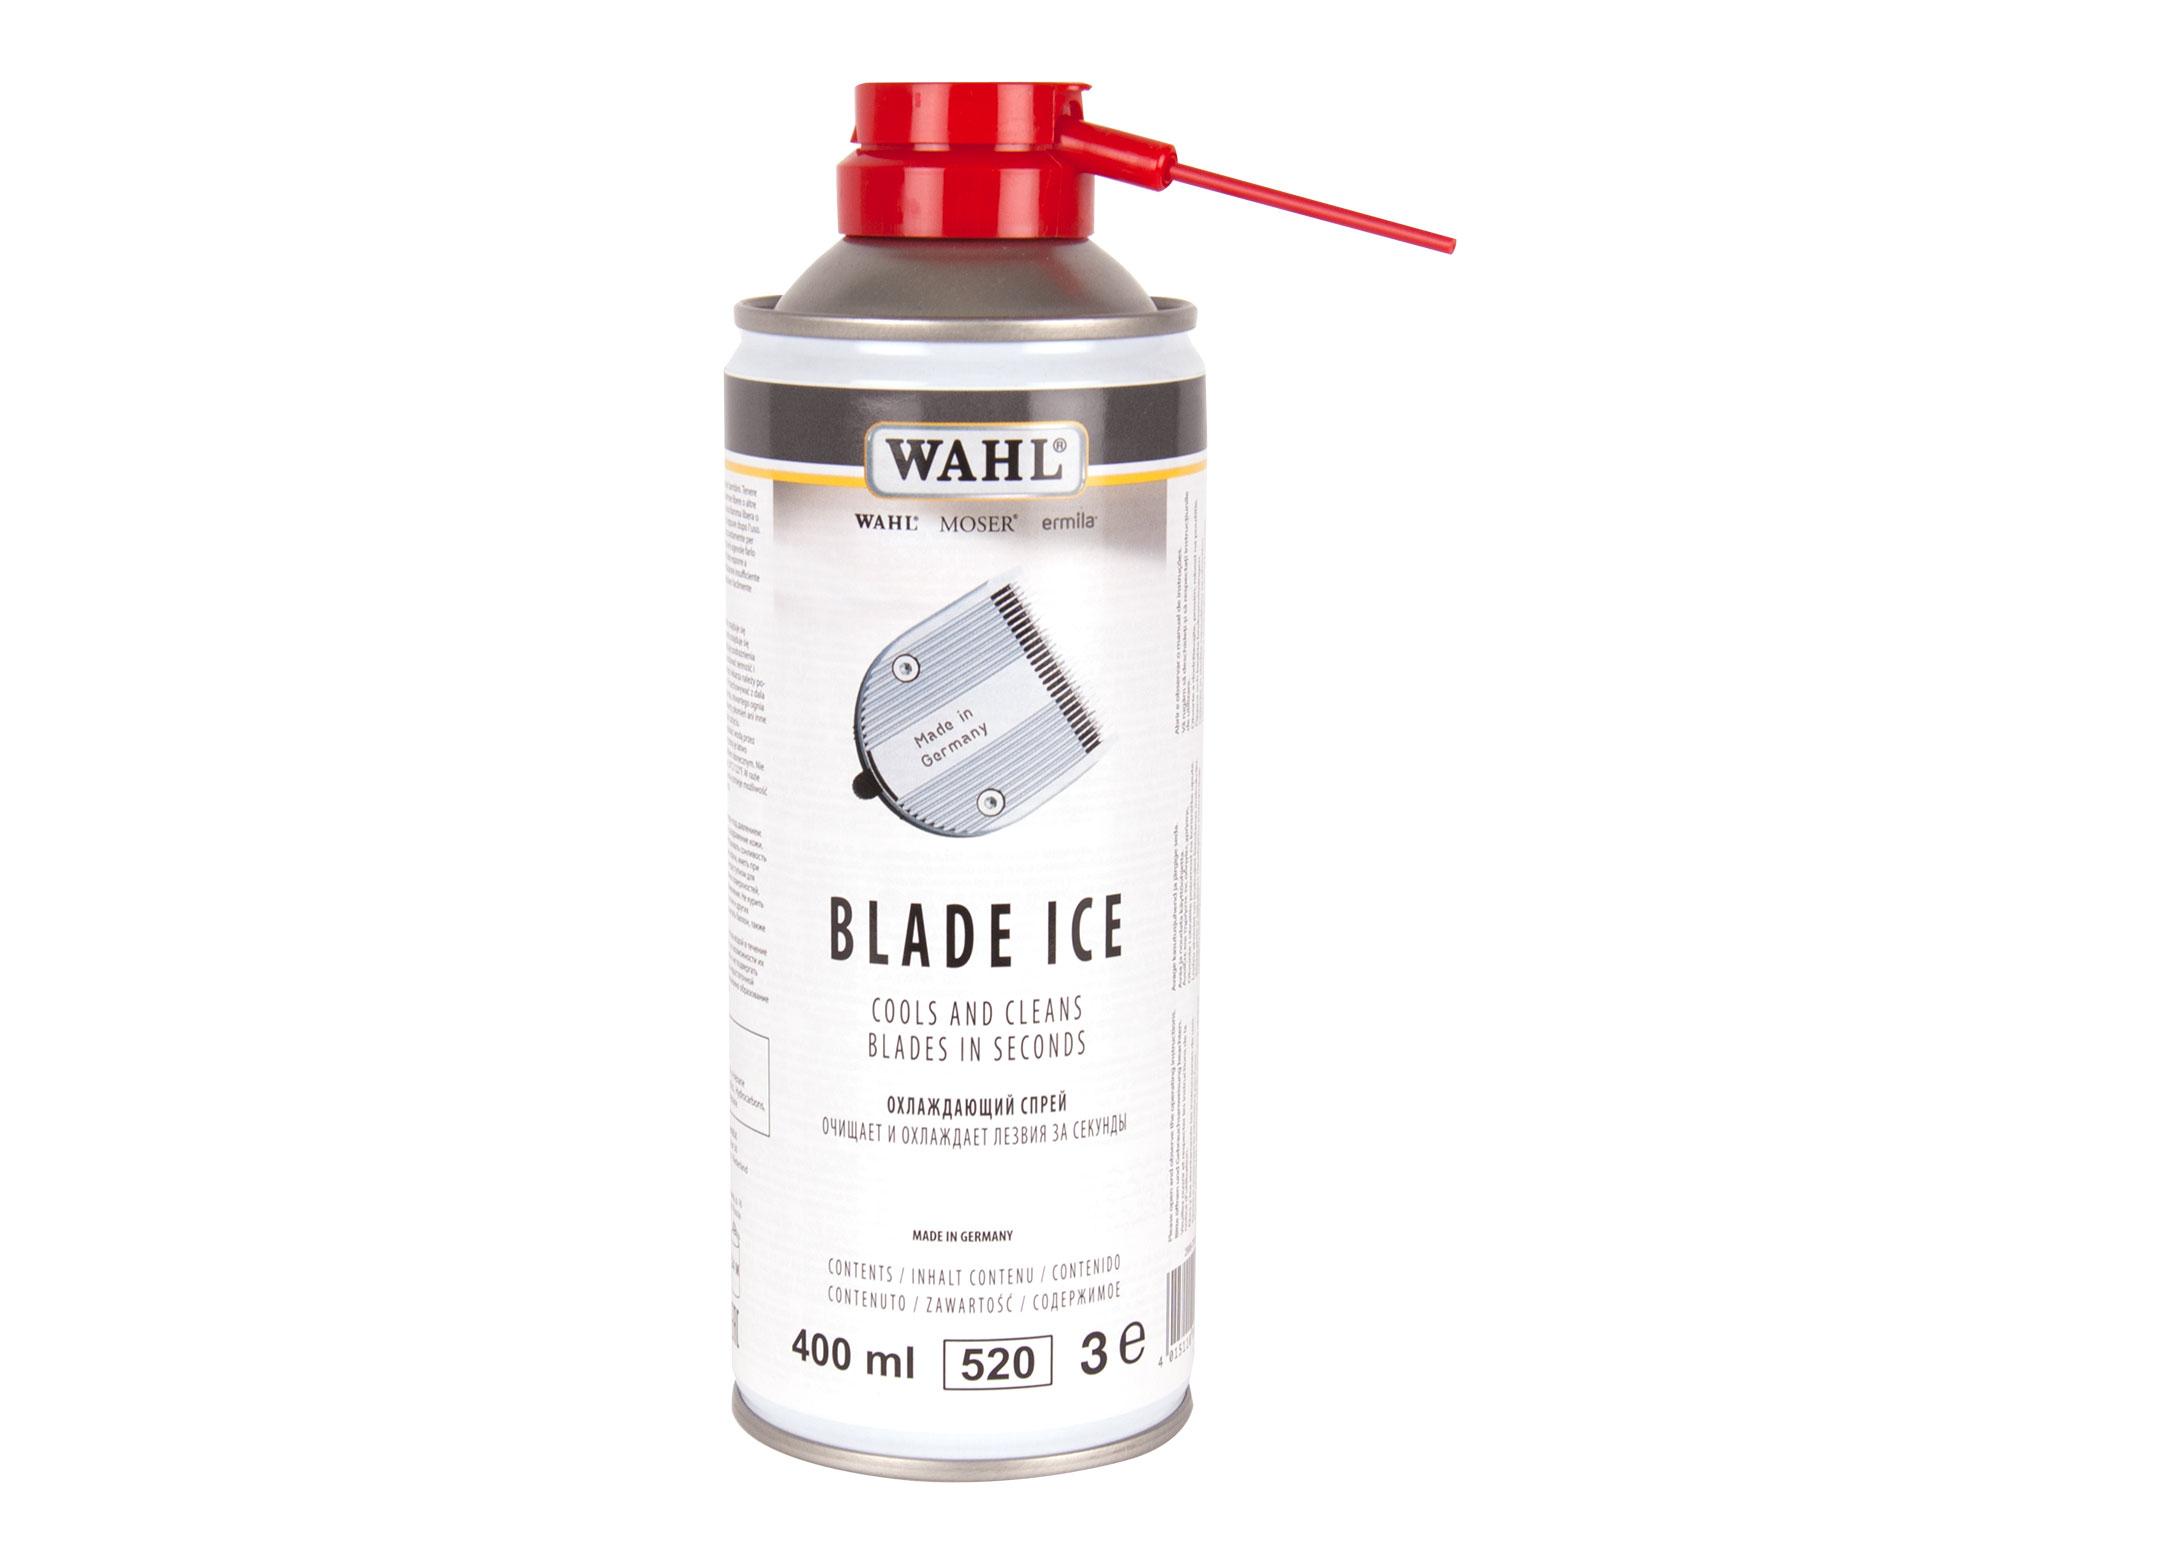 Wahl Blade Ice Spray 400 ml Blade Care